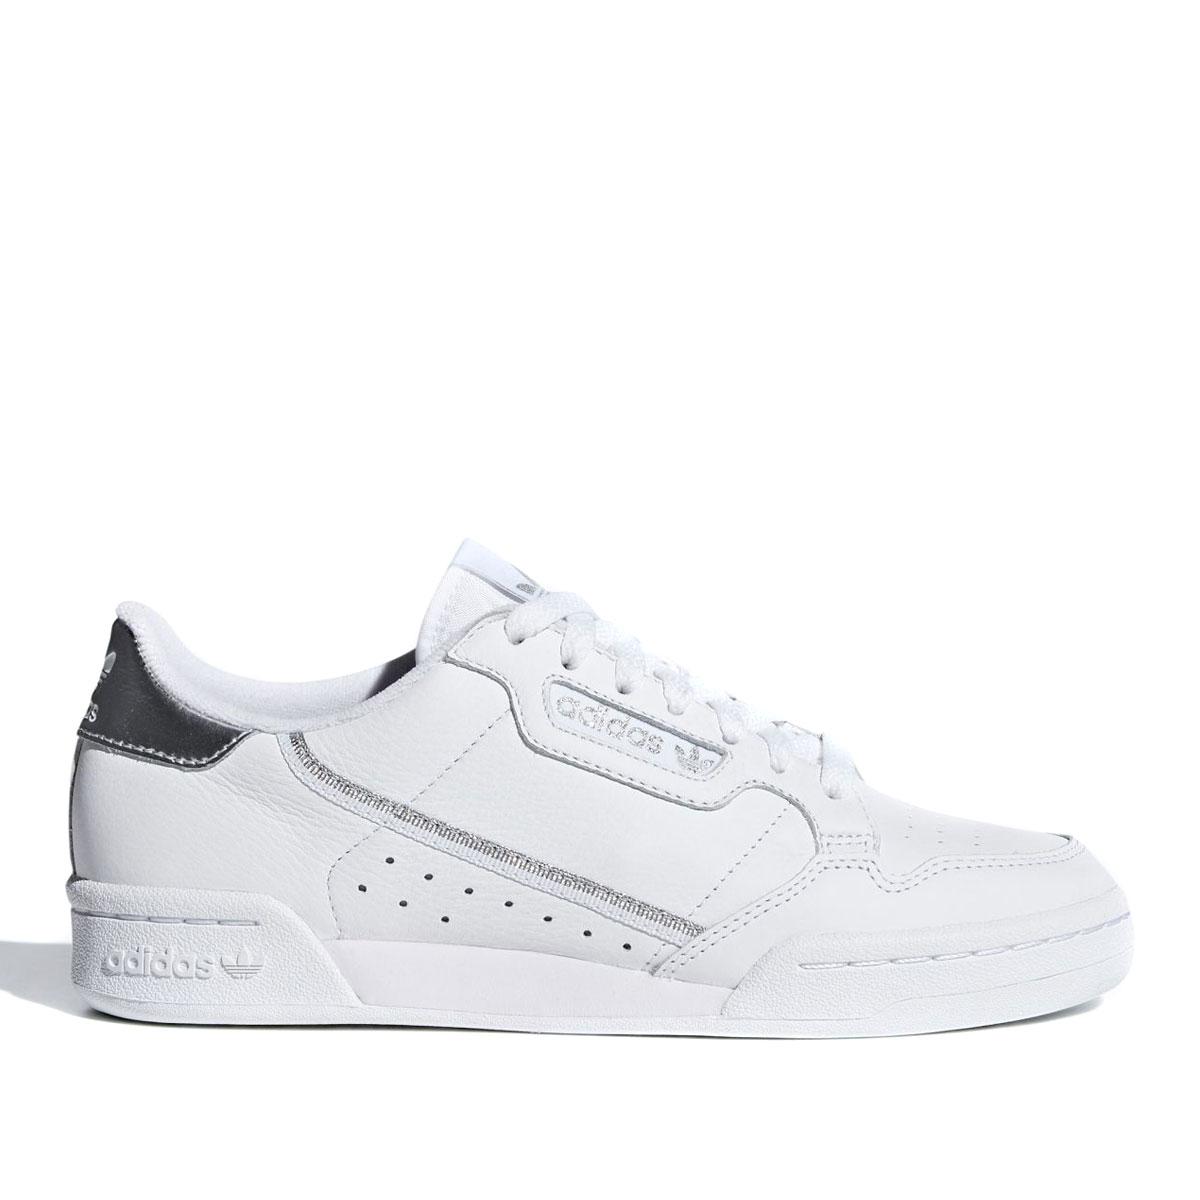 baea76755e21e9 adidas Originals CONTINENTAL 80 (RUNNING WHITE RUNNING WHITE SILVER MET) ( Adidas originals Continental 80)